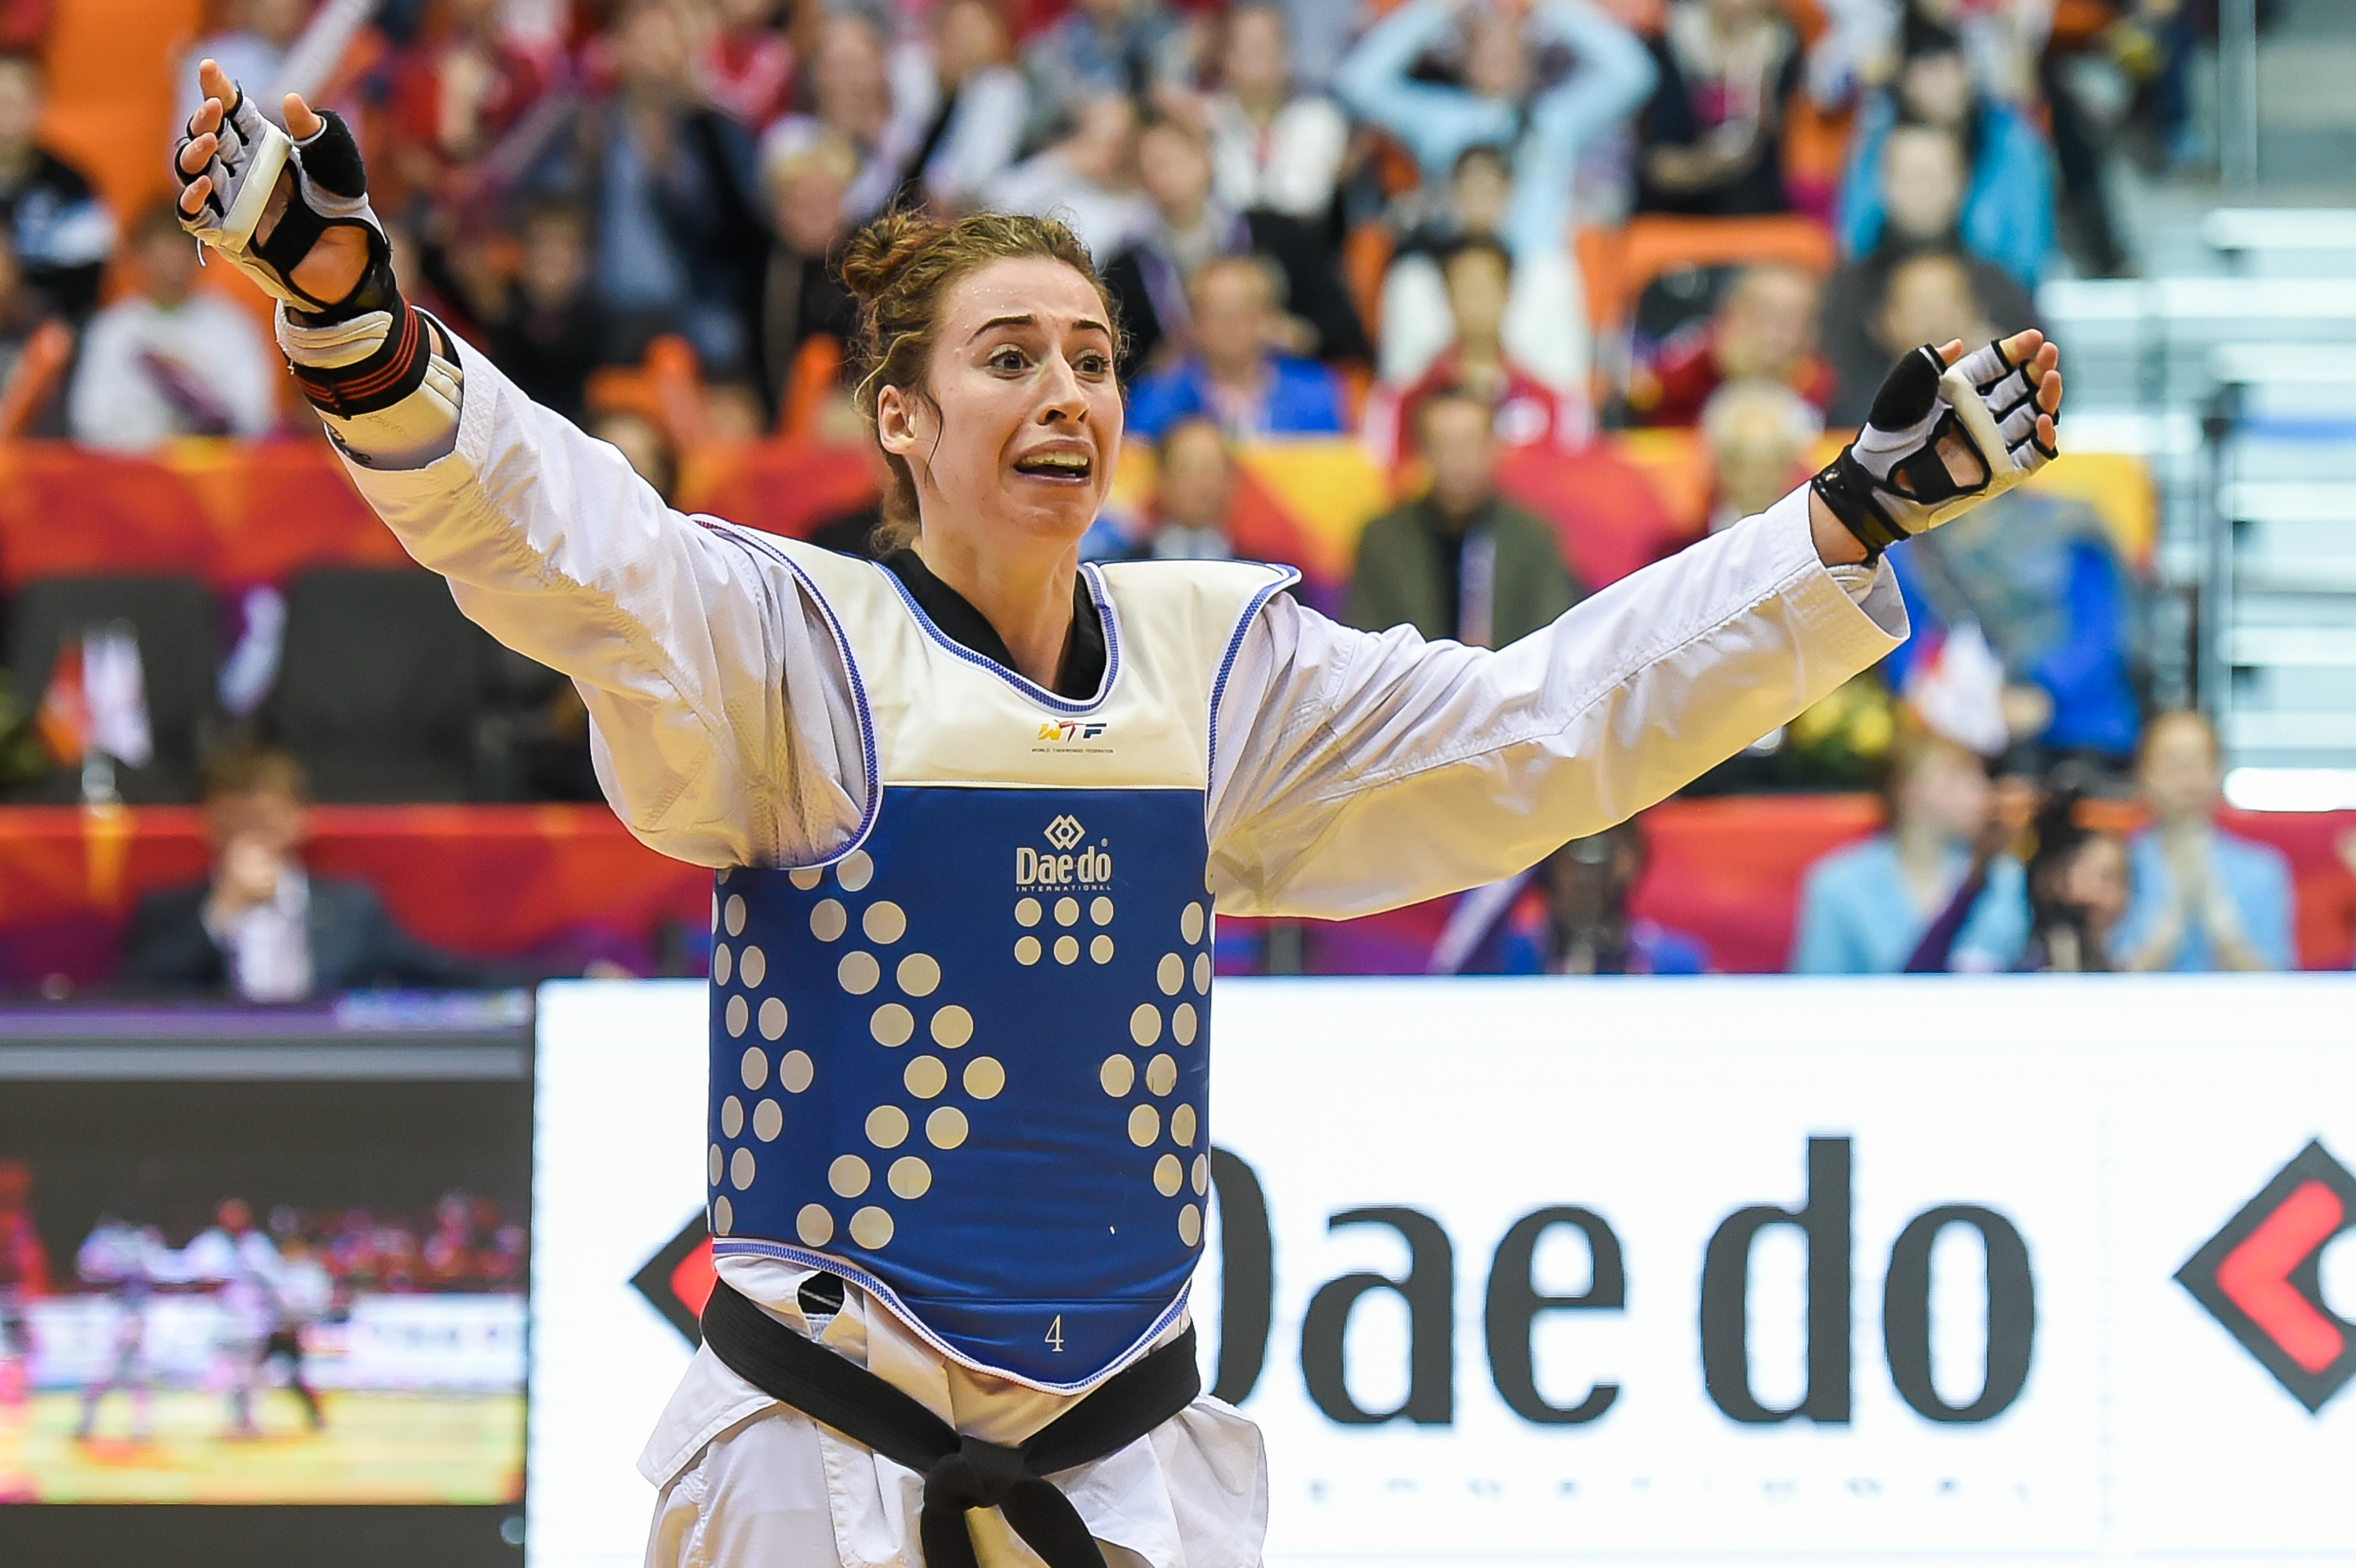 Bianca Walkden, World Championships FINAL, 2015 160515, rights free c.o. GB Taekwondo (2)